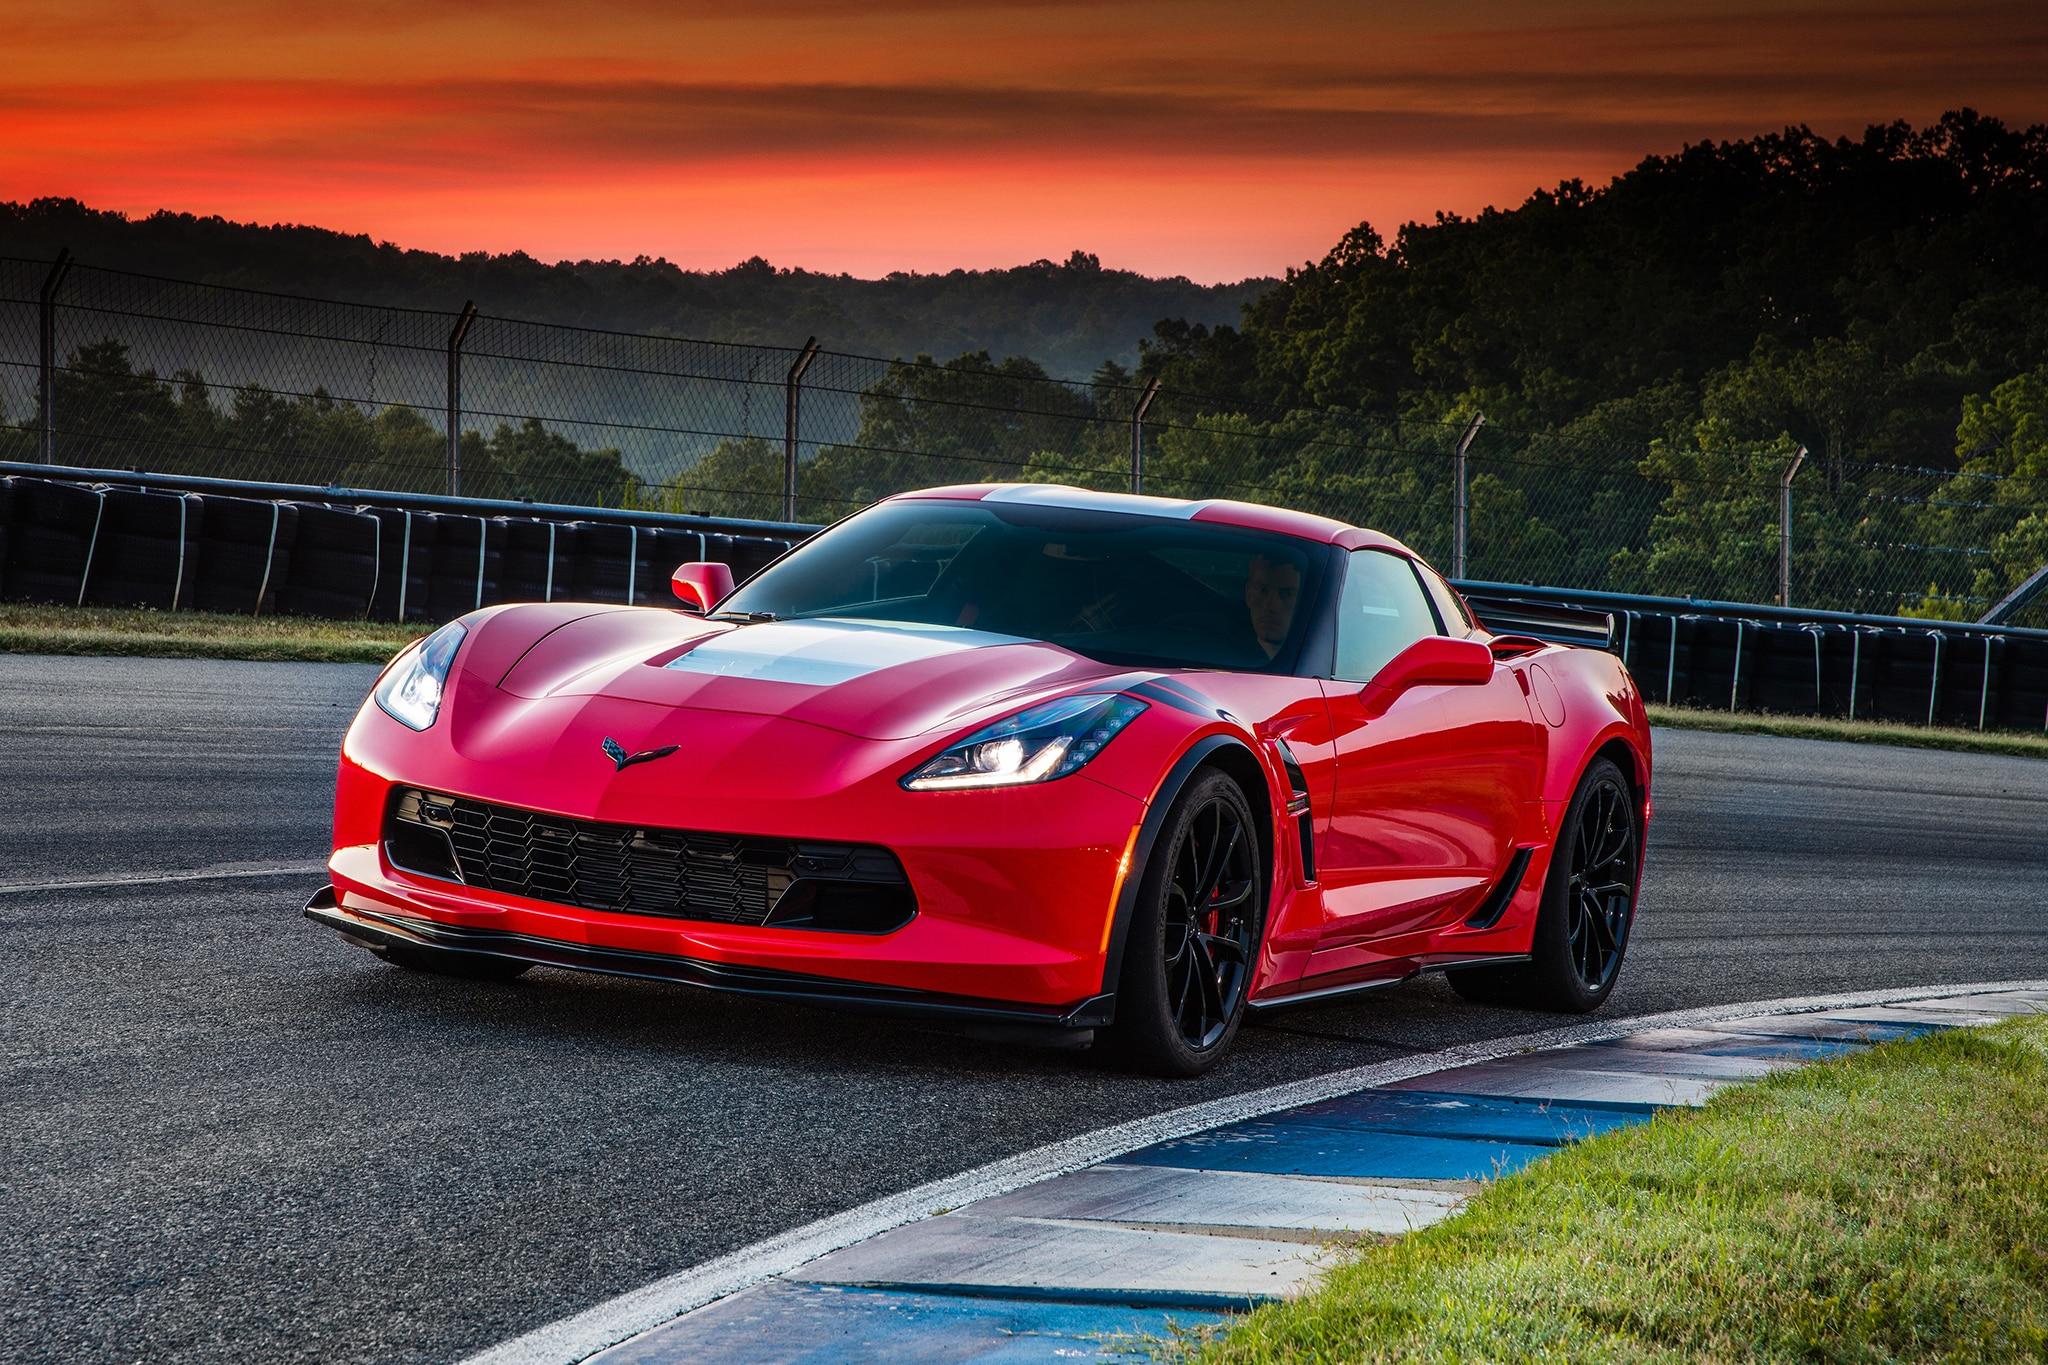 2017 Chevrolet Corvette Grand Sport Front Three Quarter 03